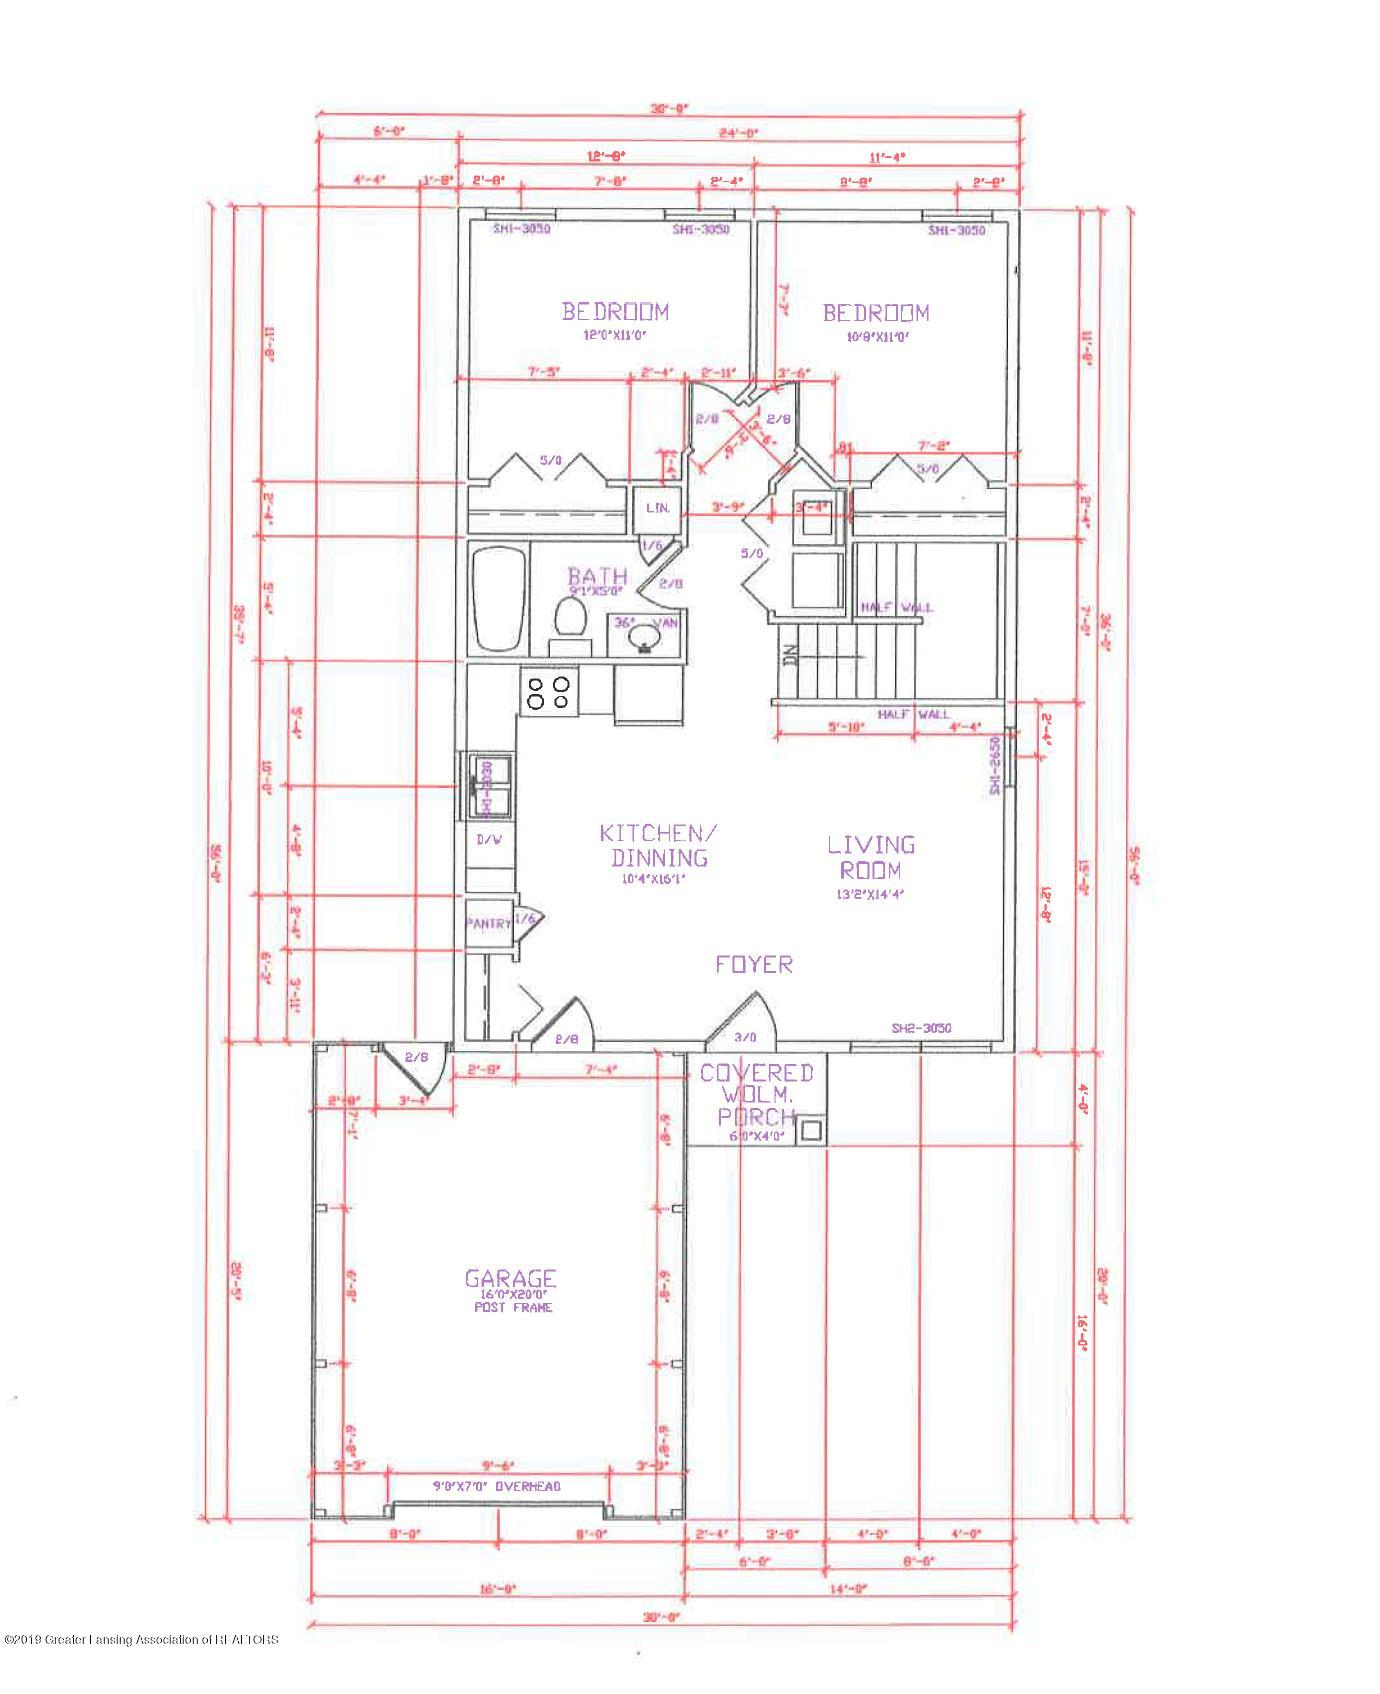 300 E Miller Rd - plan 1 - 3